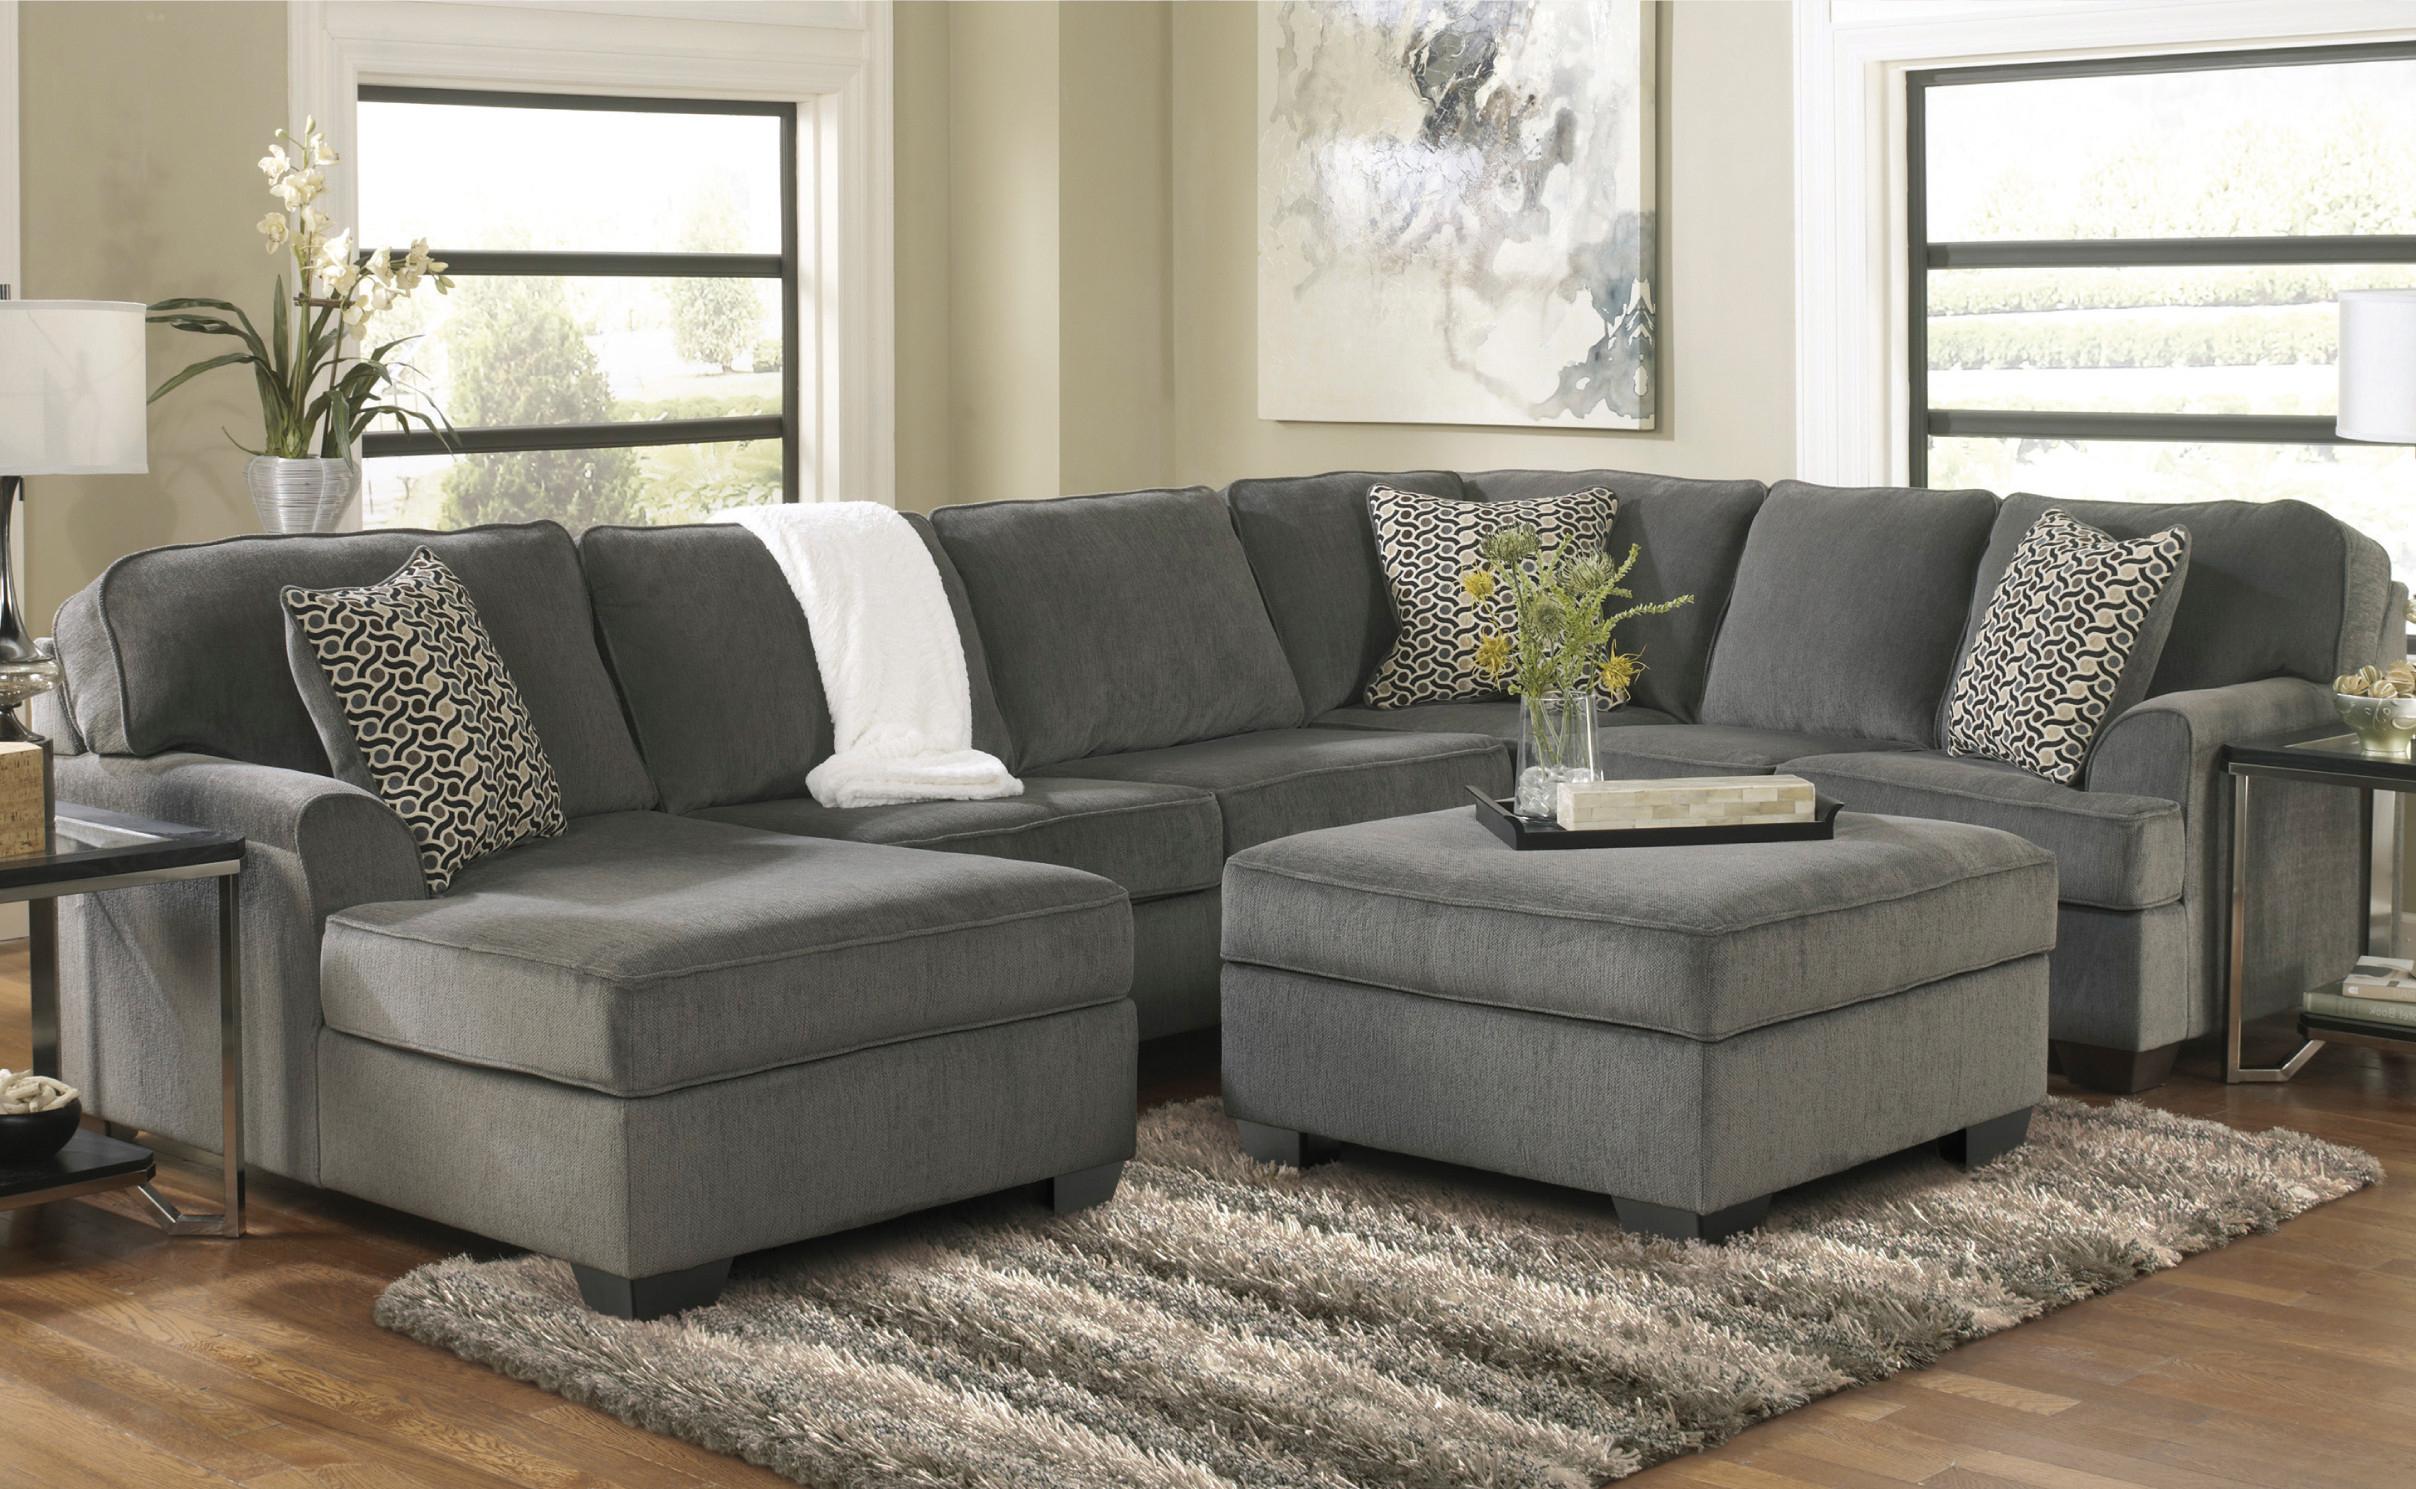 Baci Living Room (Gallery 9 of 20)